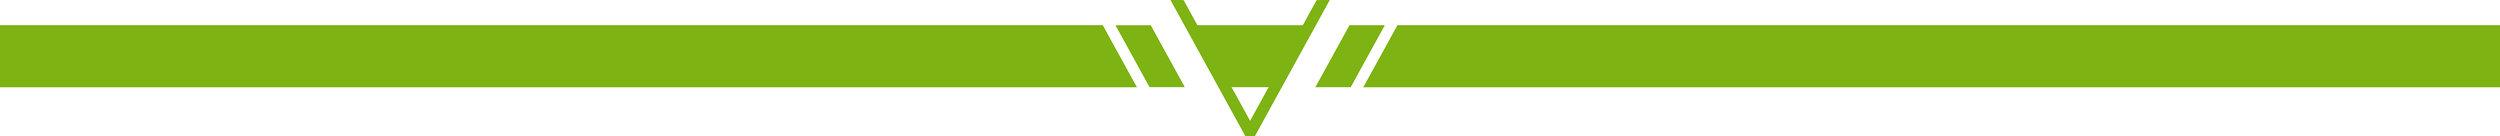 OVO logo 3.jpg